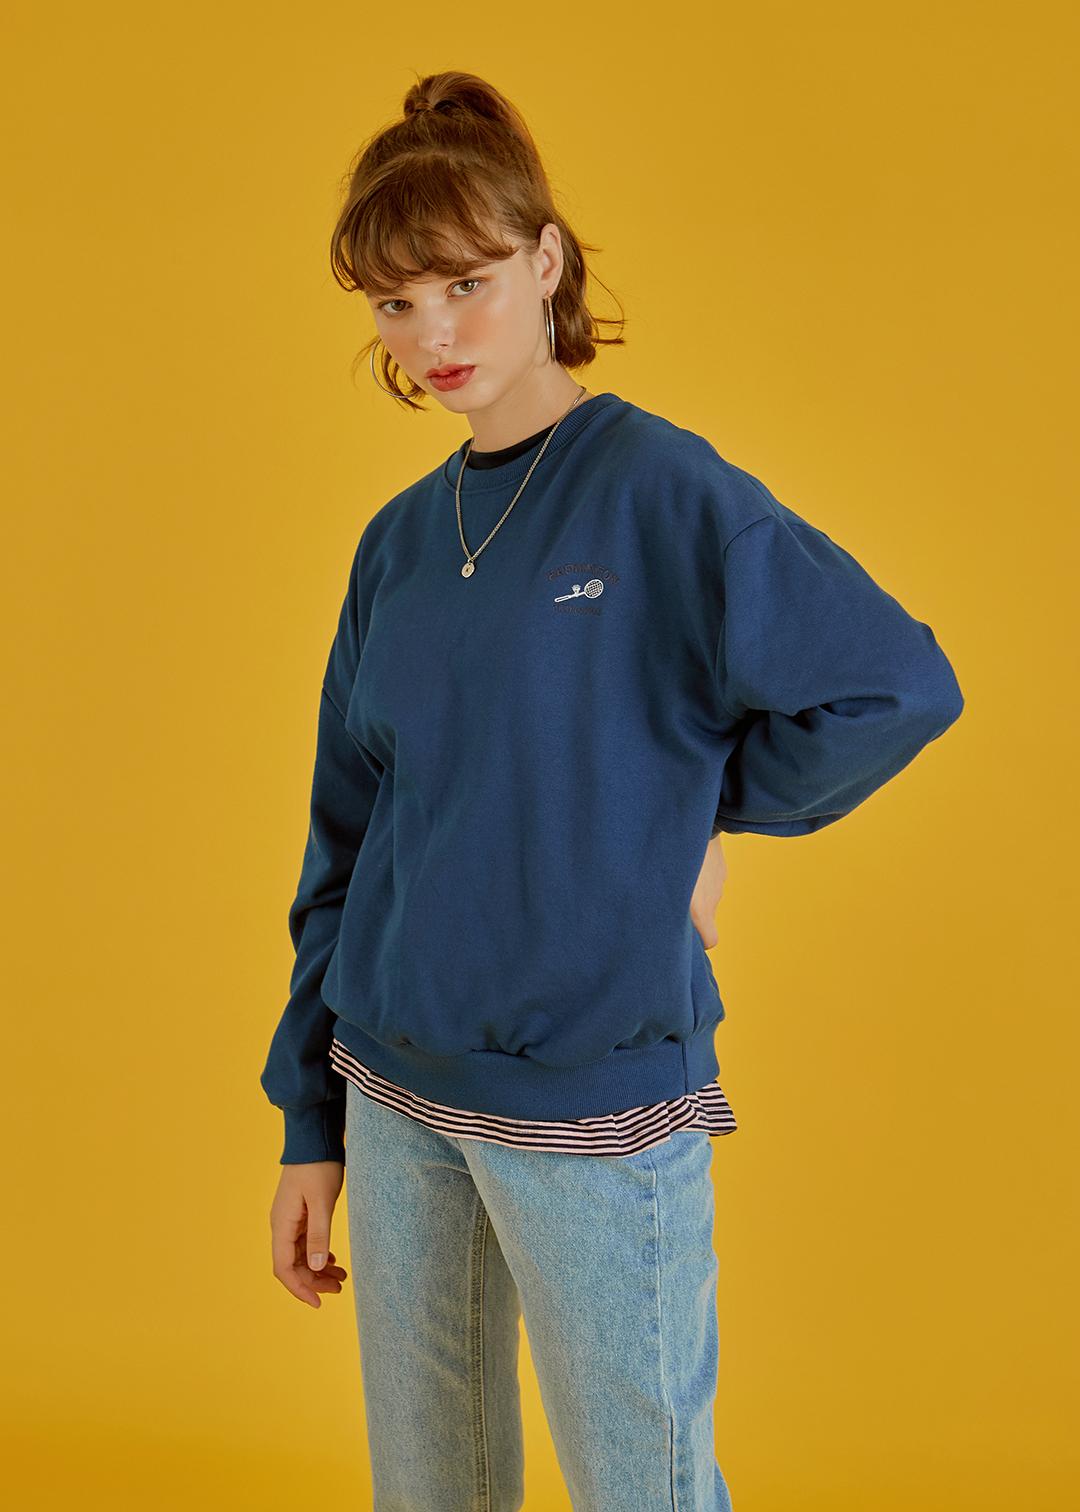 Badminton Lettering Sweatshirt